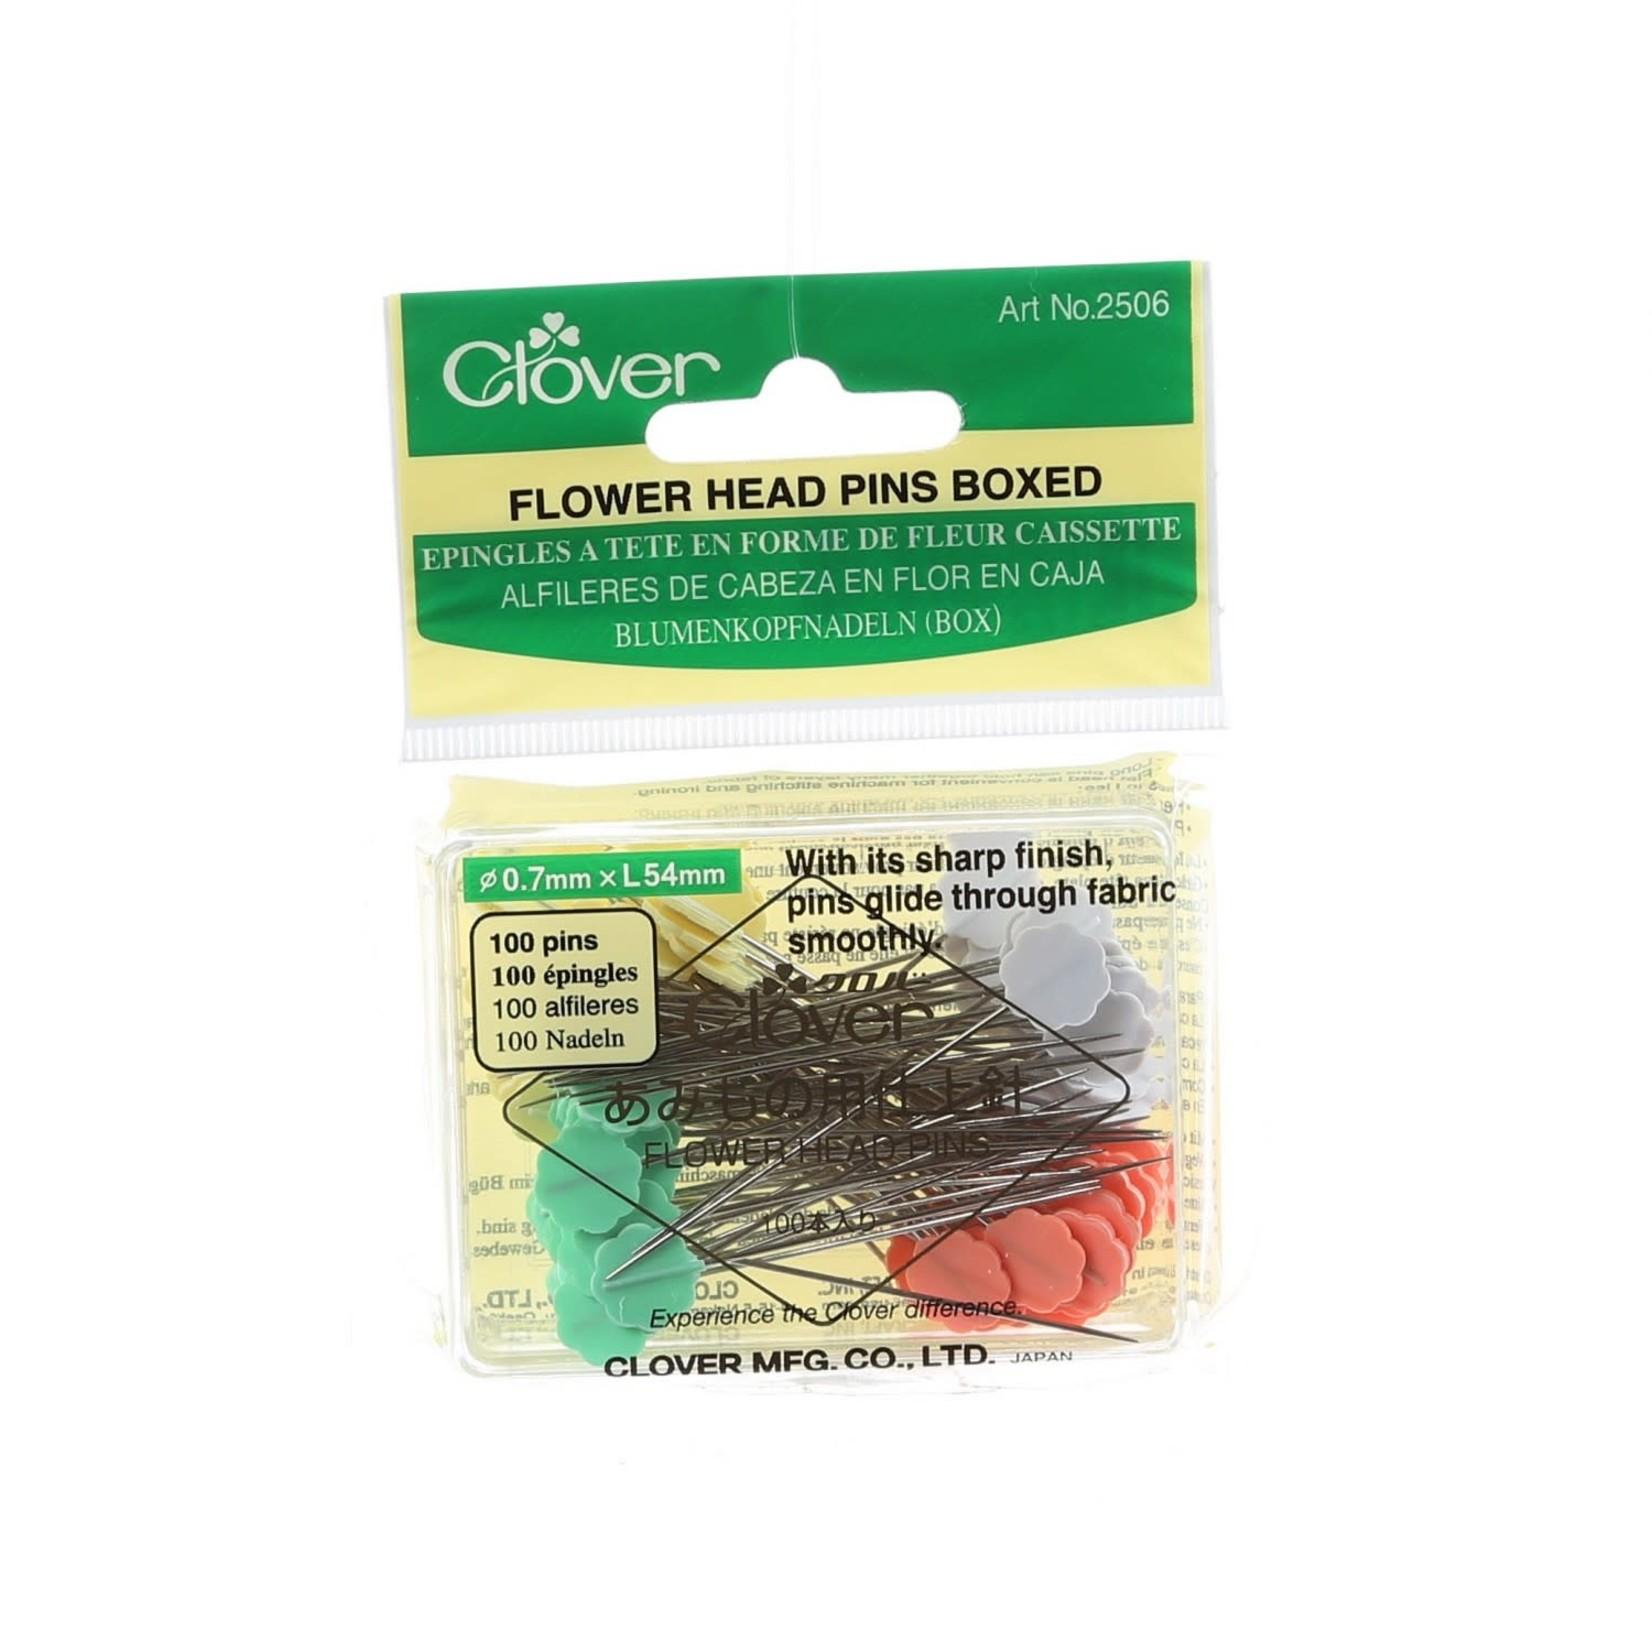 Clover Spelden - Flat Flower Pins - 54 mm - 100 stuks